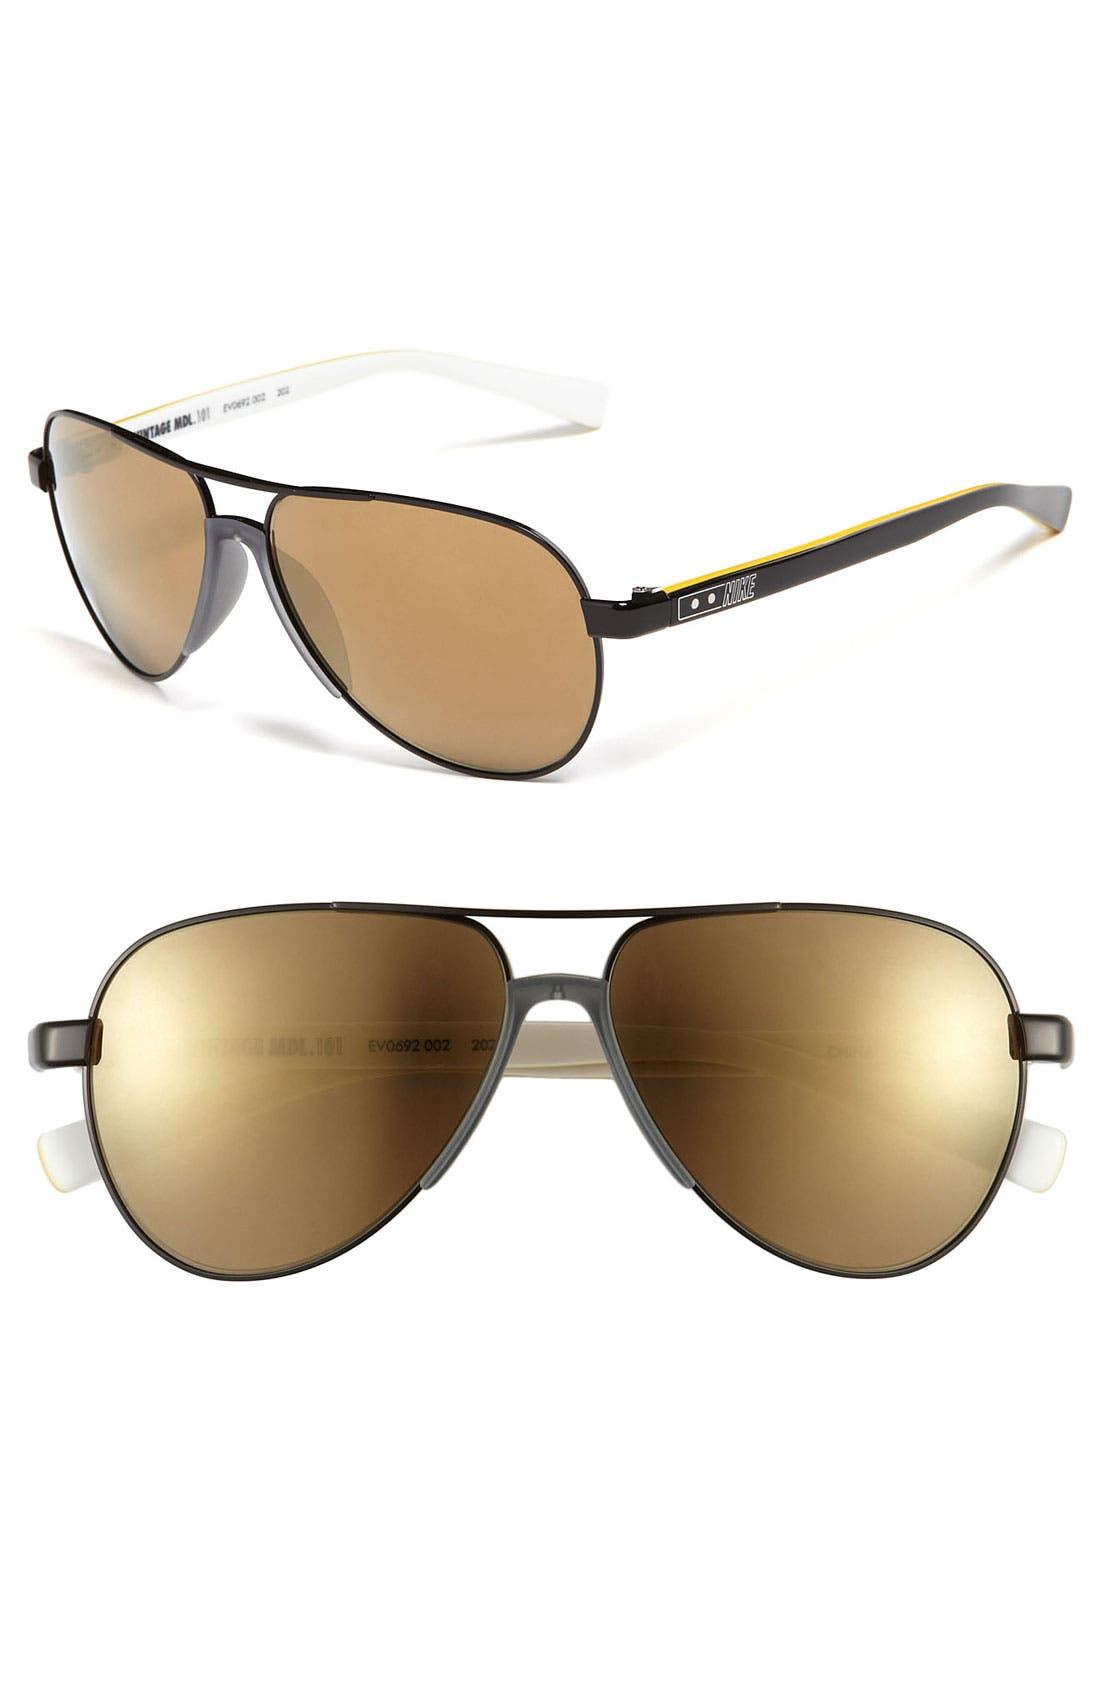 Main Image - Nike Aviator Sunglasses